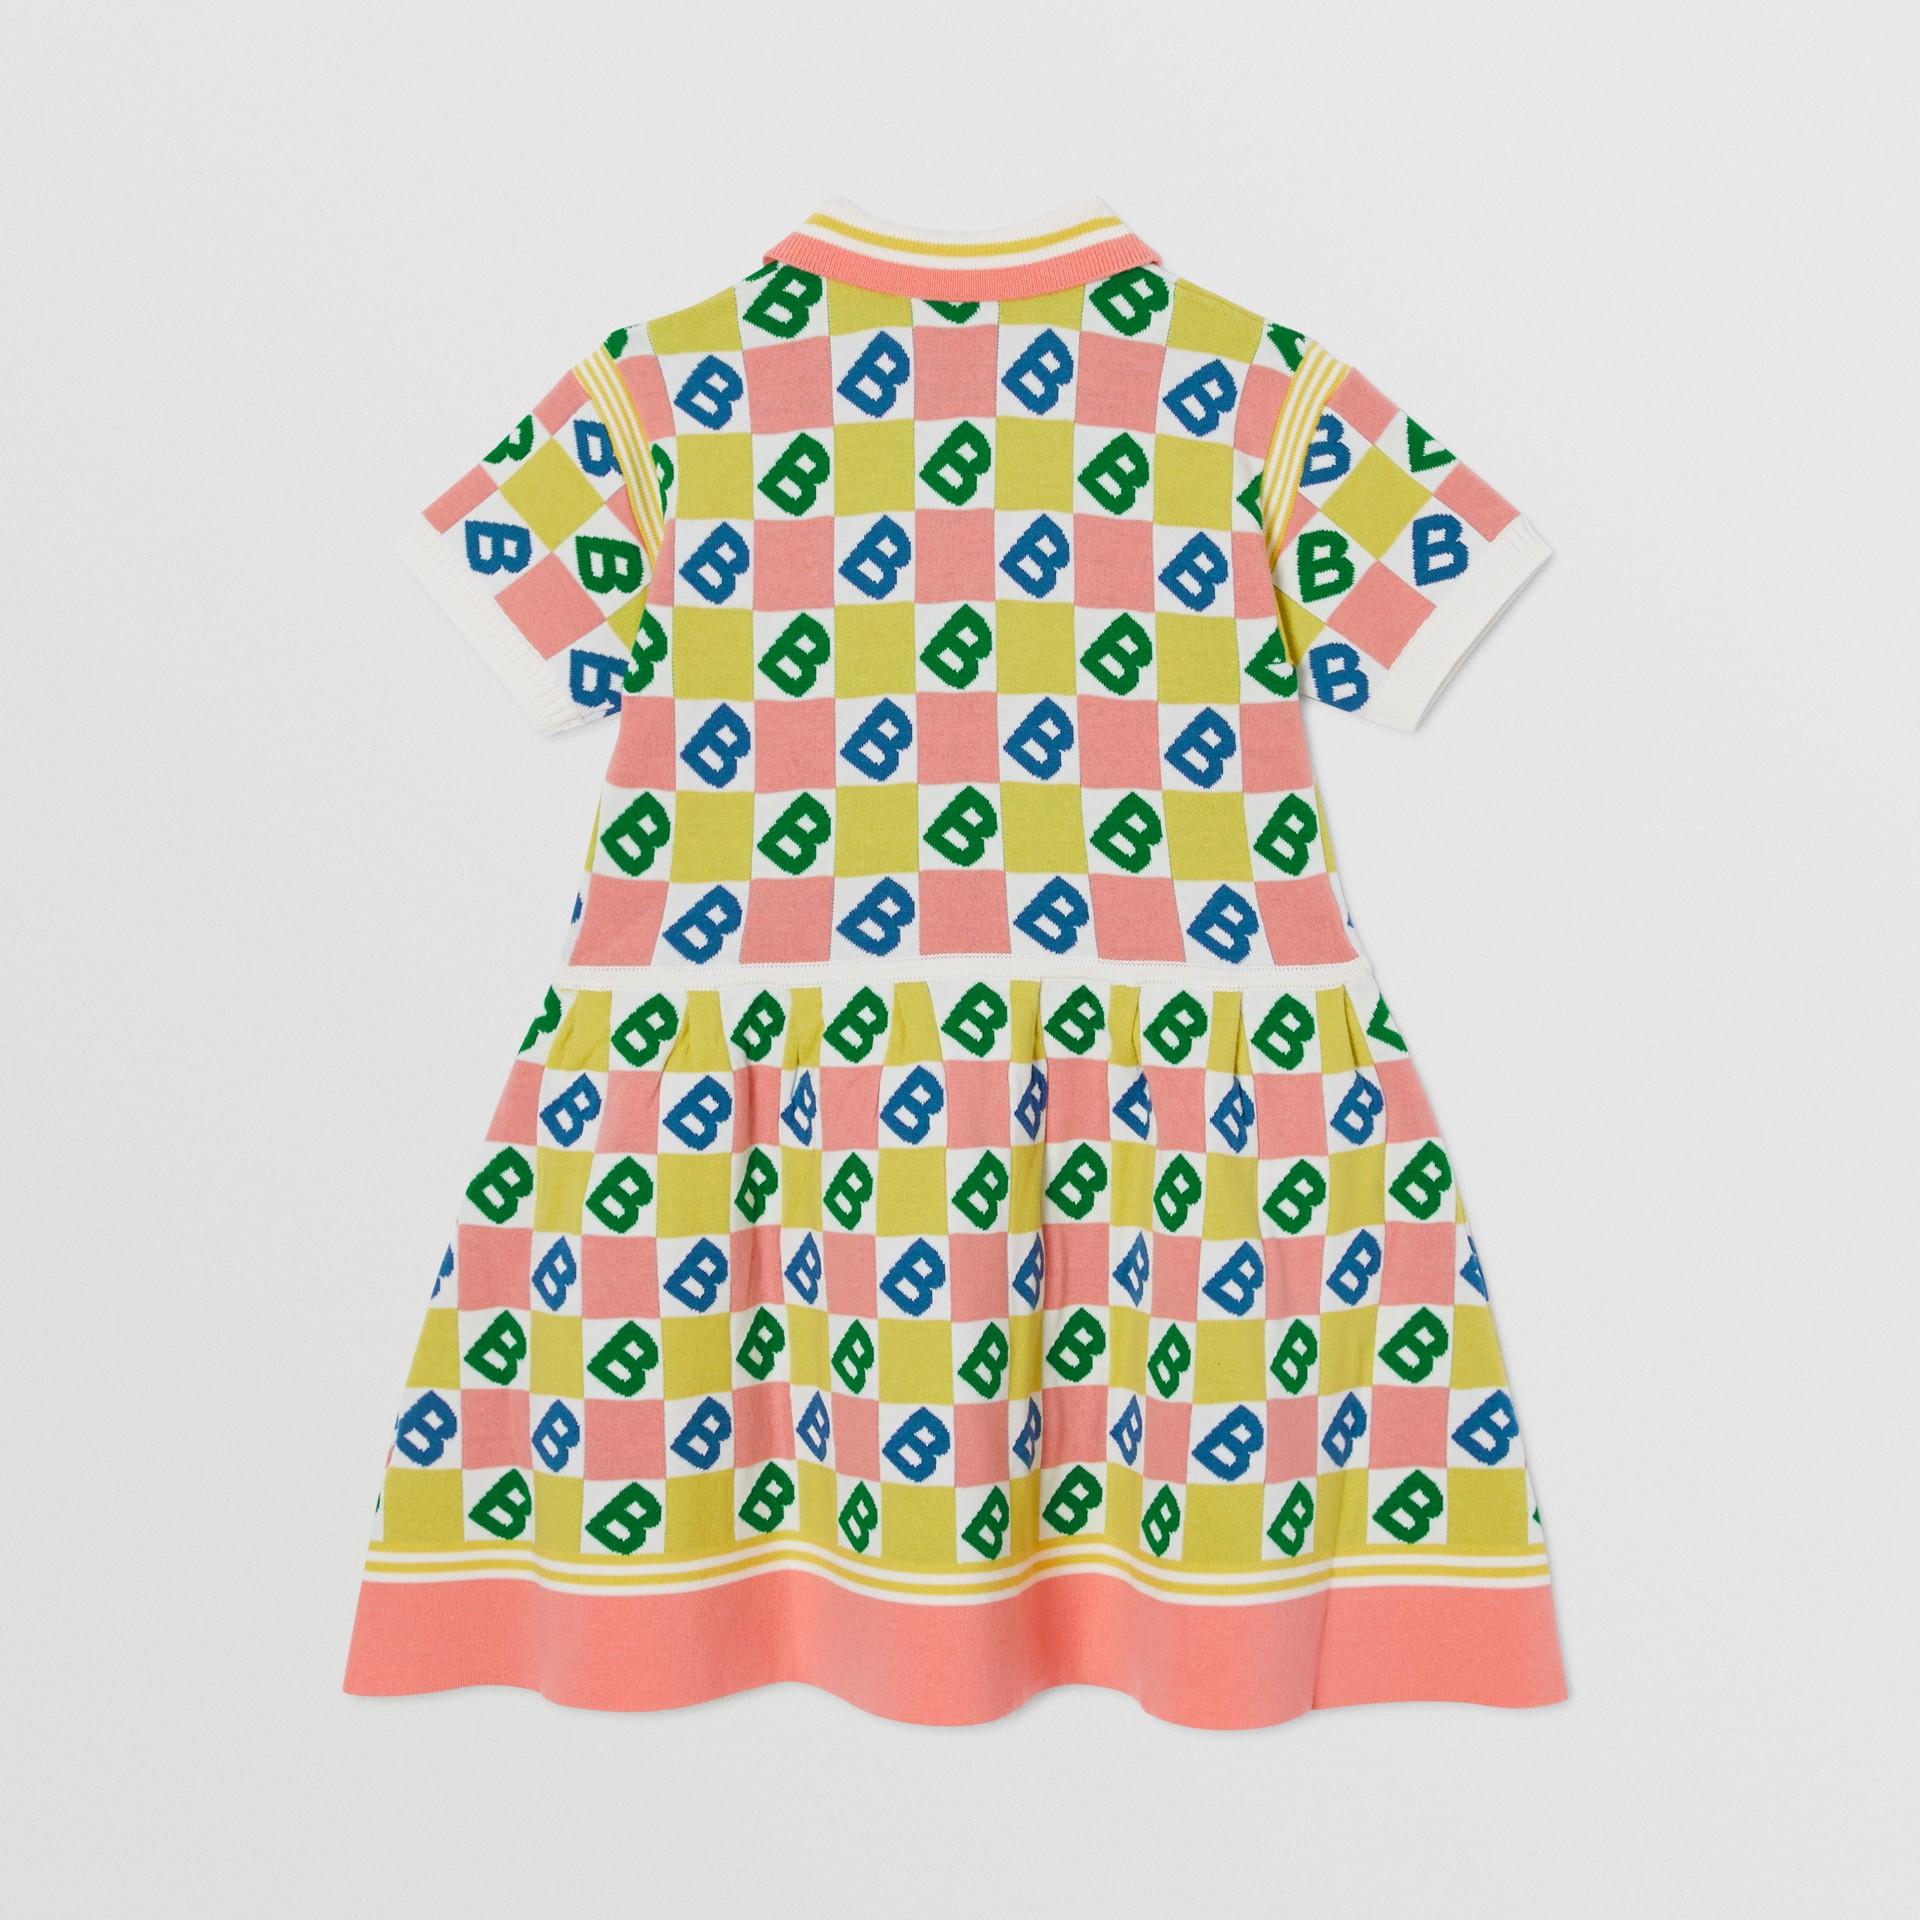 B Motif Merino Wool Cotton Cashmere Polo Shirt Dress in Peach | Burberry - gallery image 3